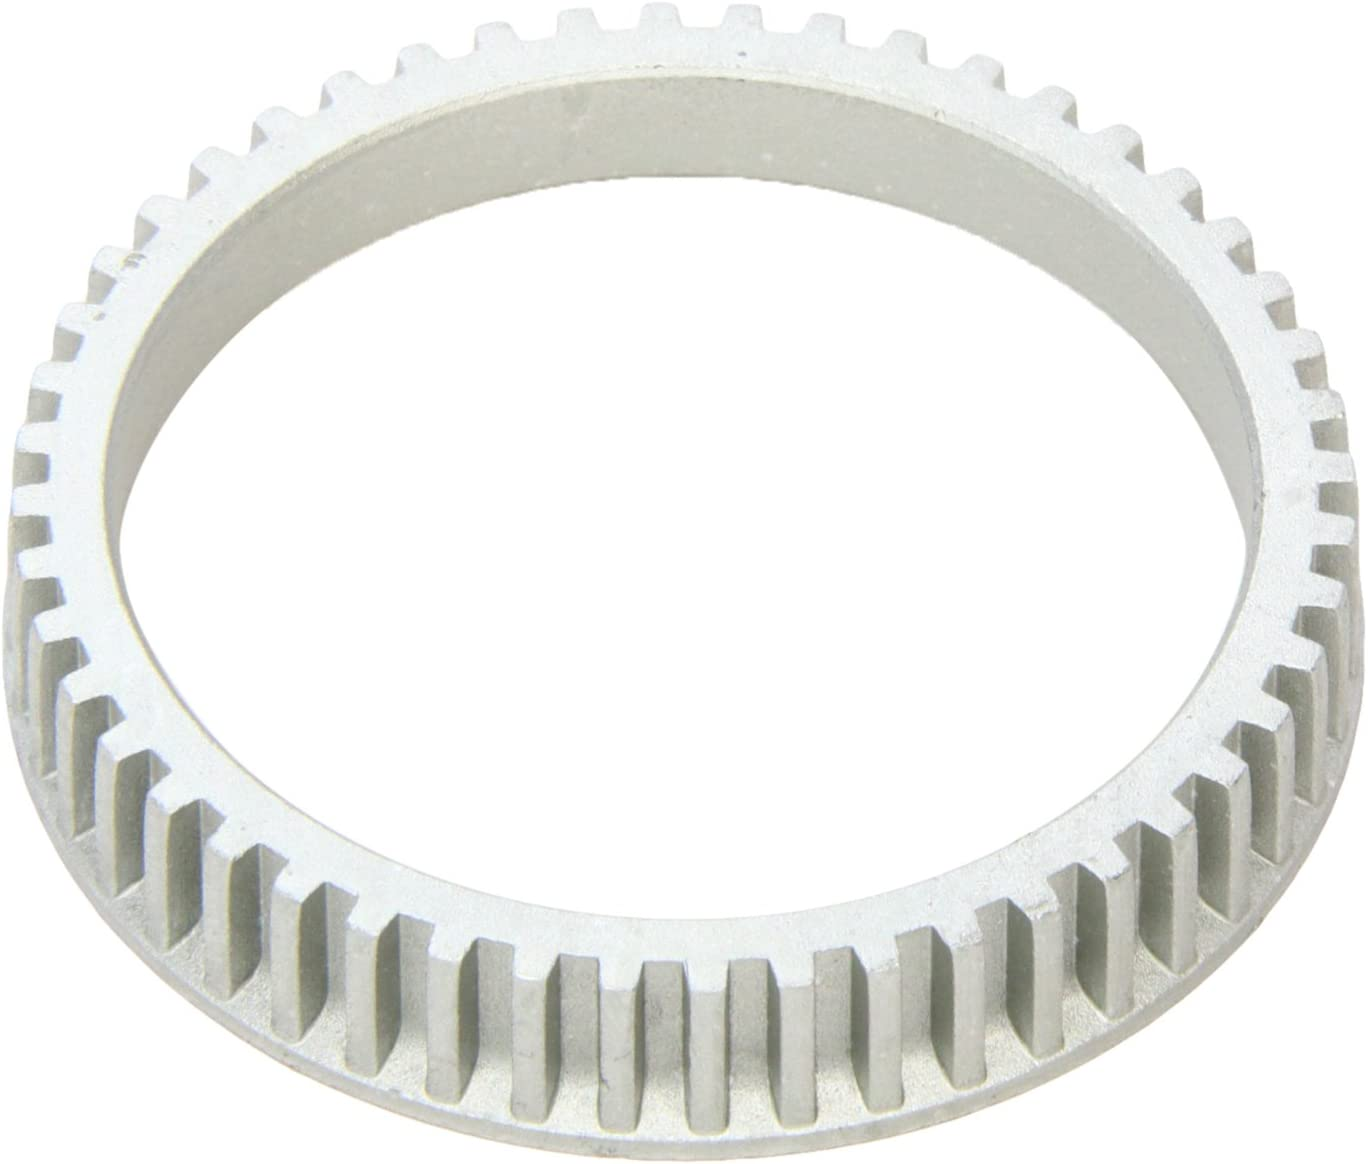 Black Mapco 76141 ABS Sensor Ring